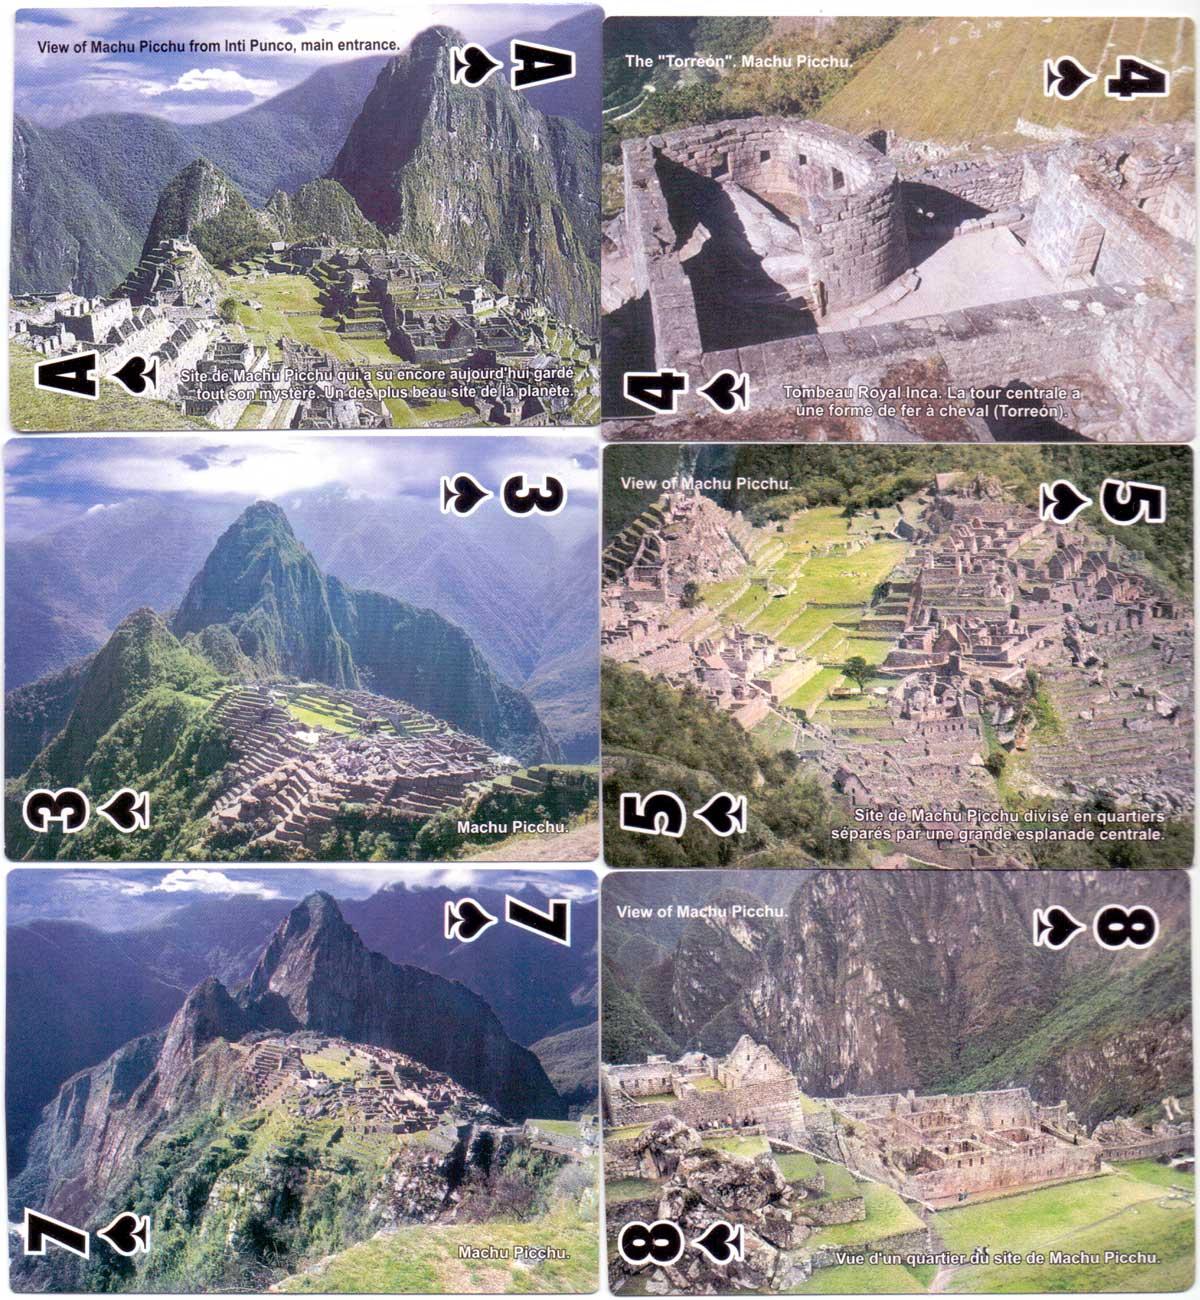 Peru Rail souvenir playing-cards